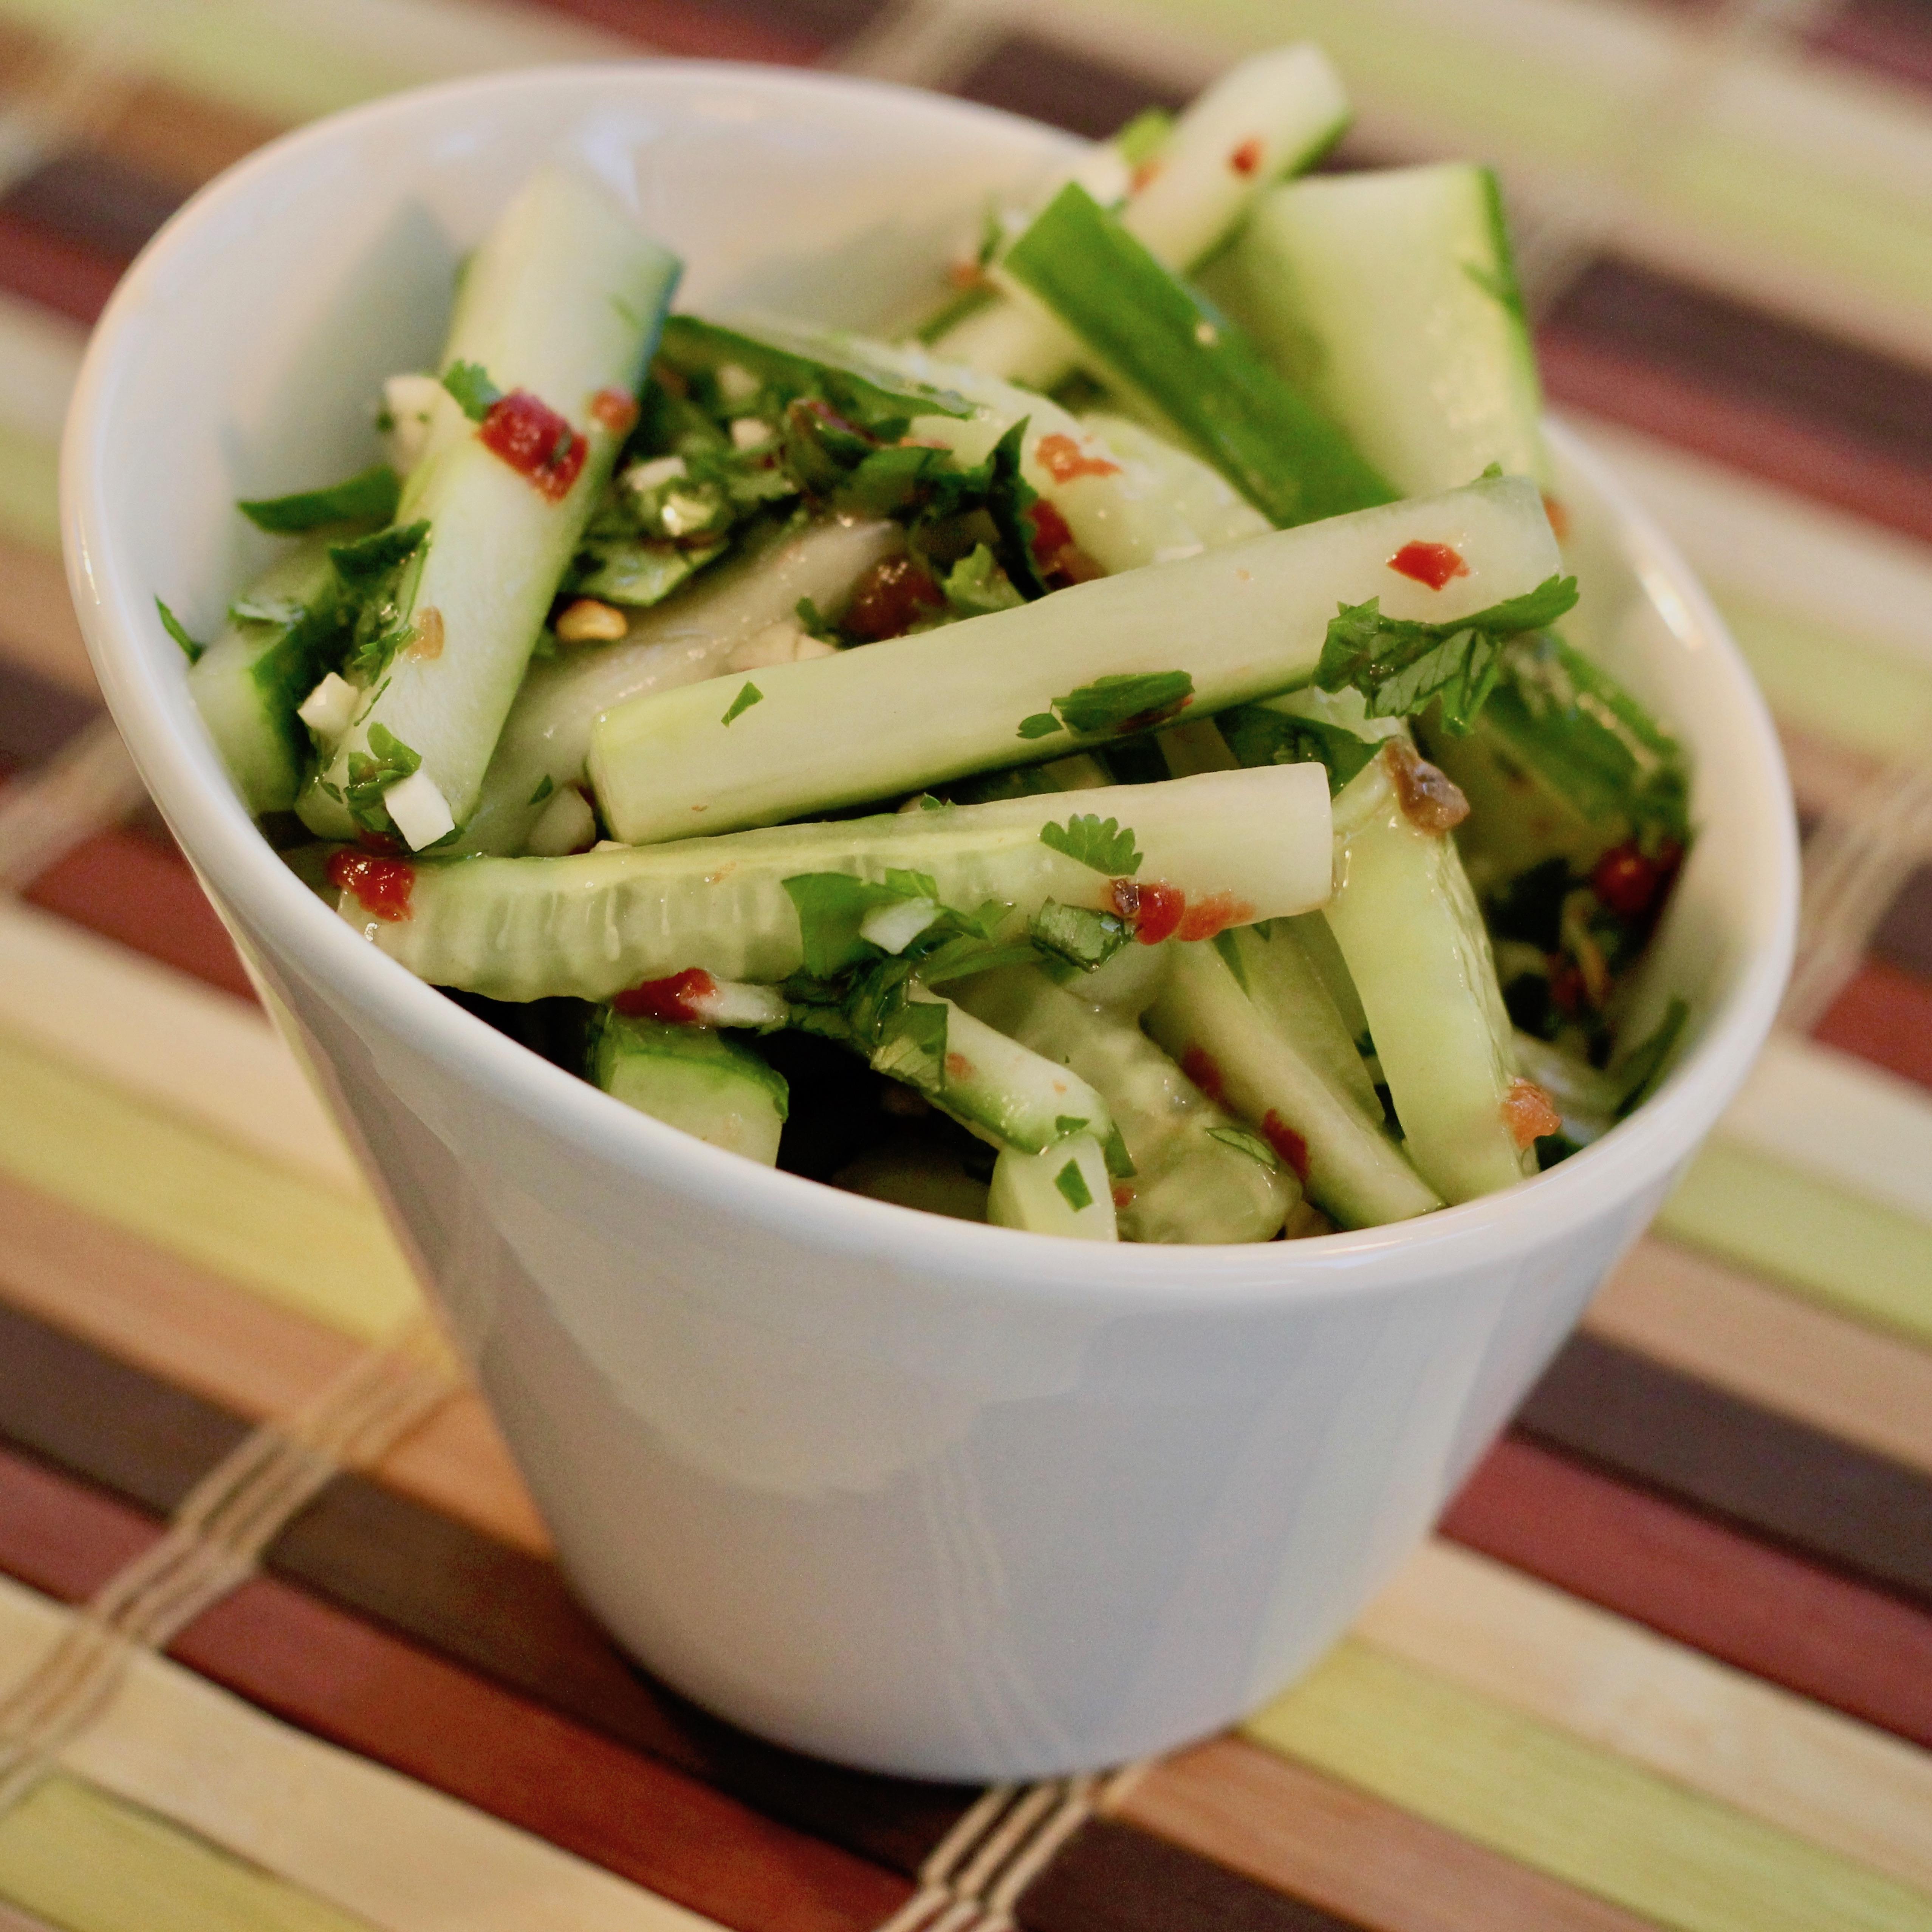 Cilantro Lime Cucumber Salad lutzflcat